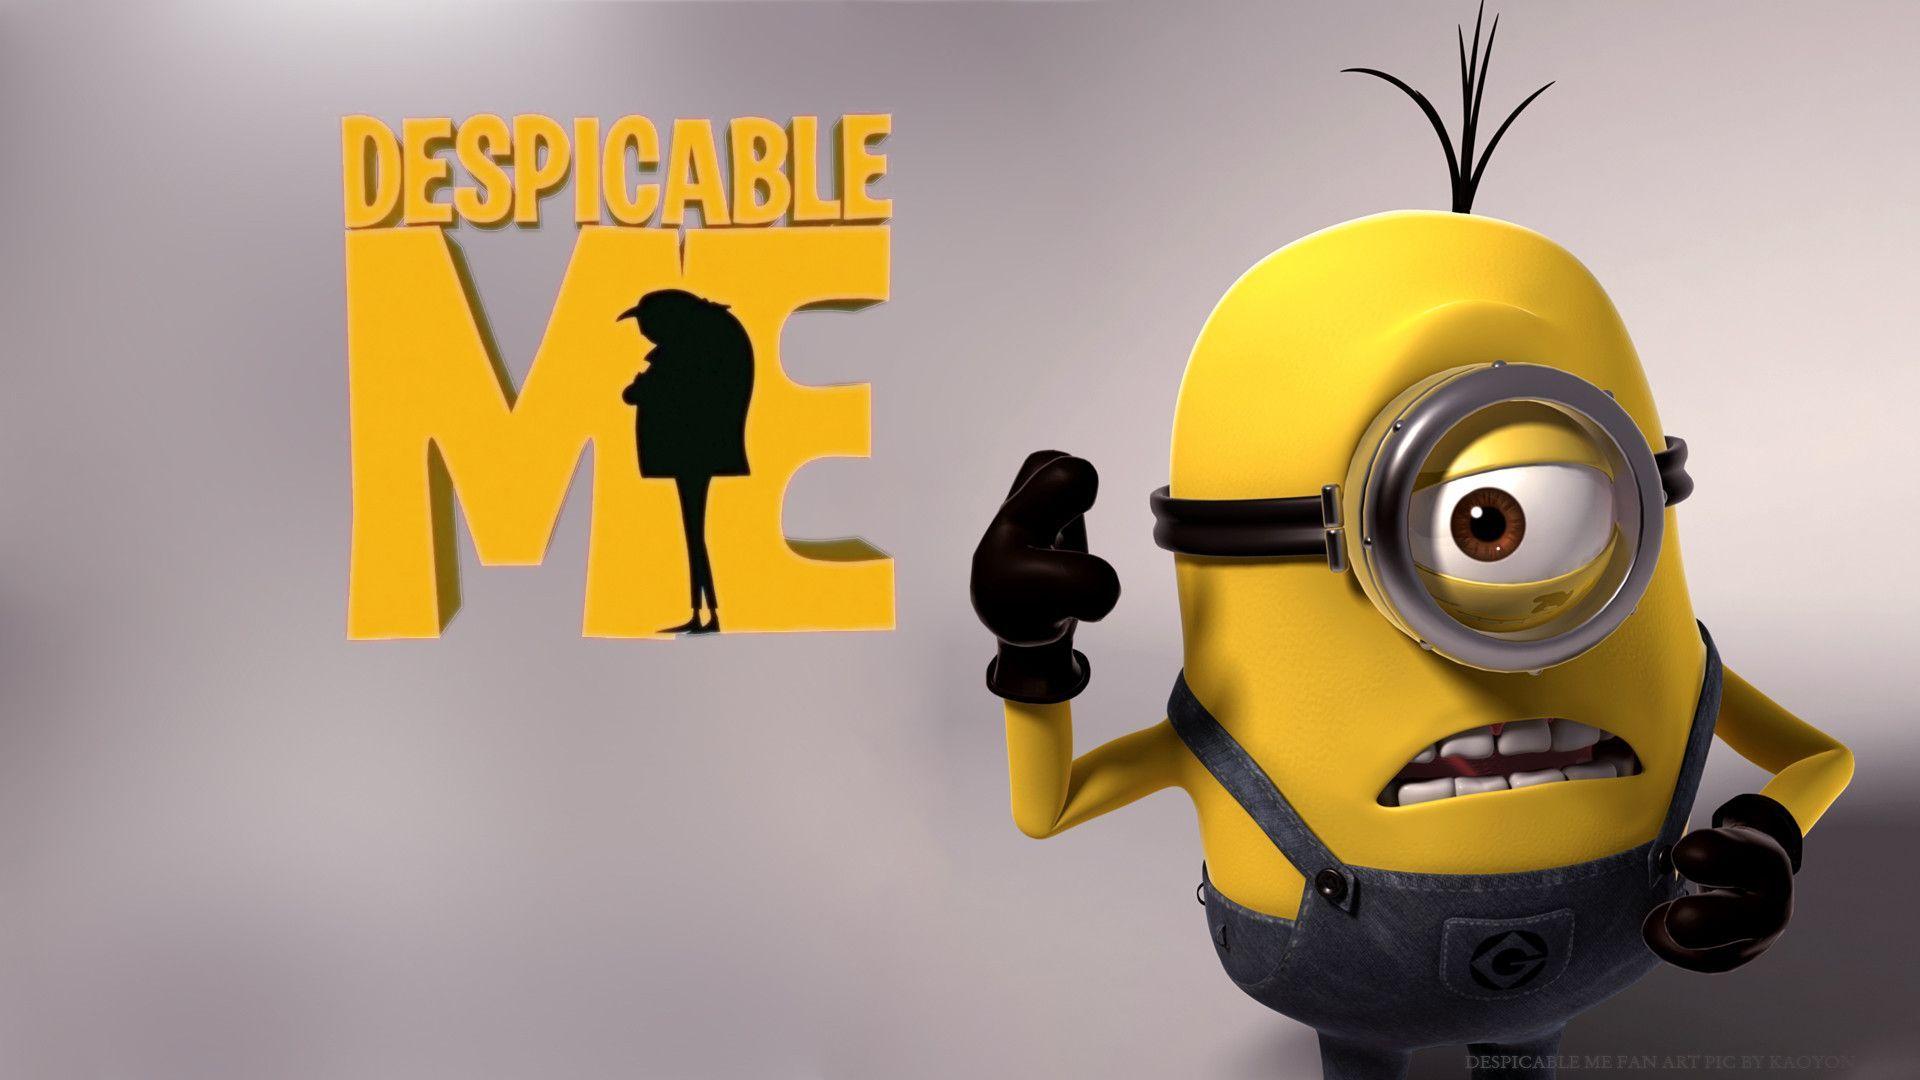 UW Despicable Me Minions Full HD